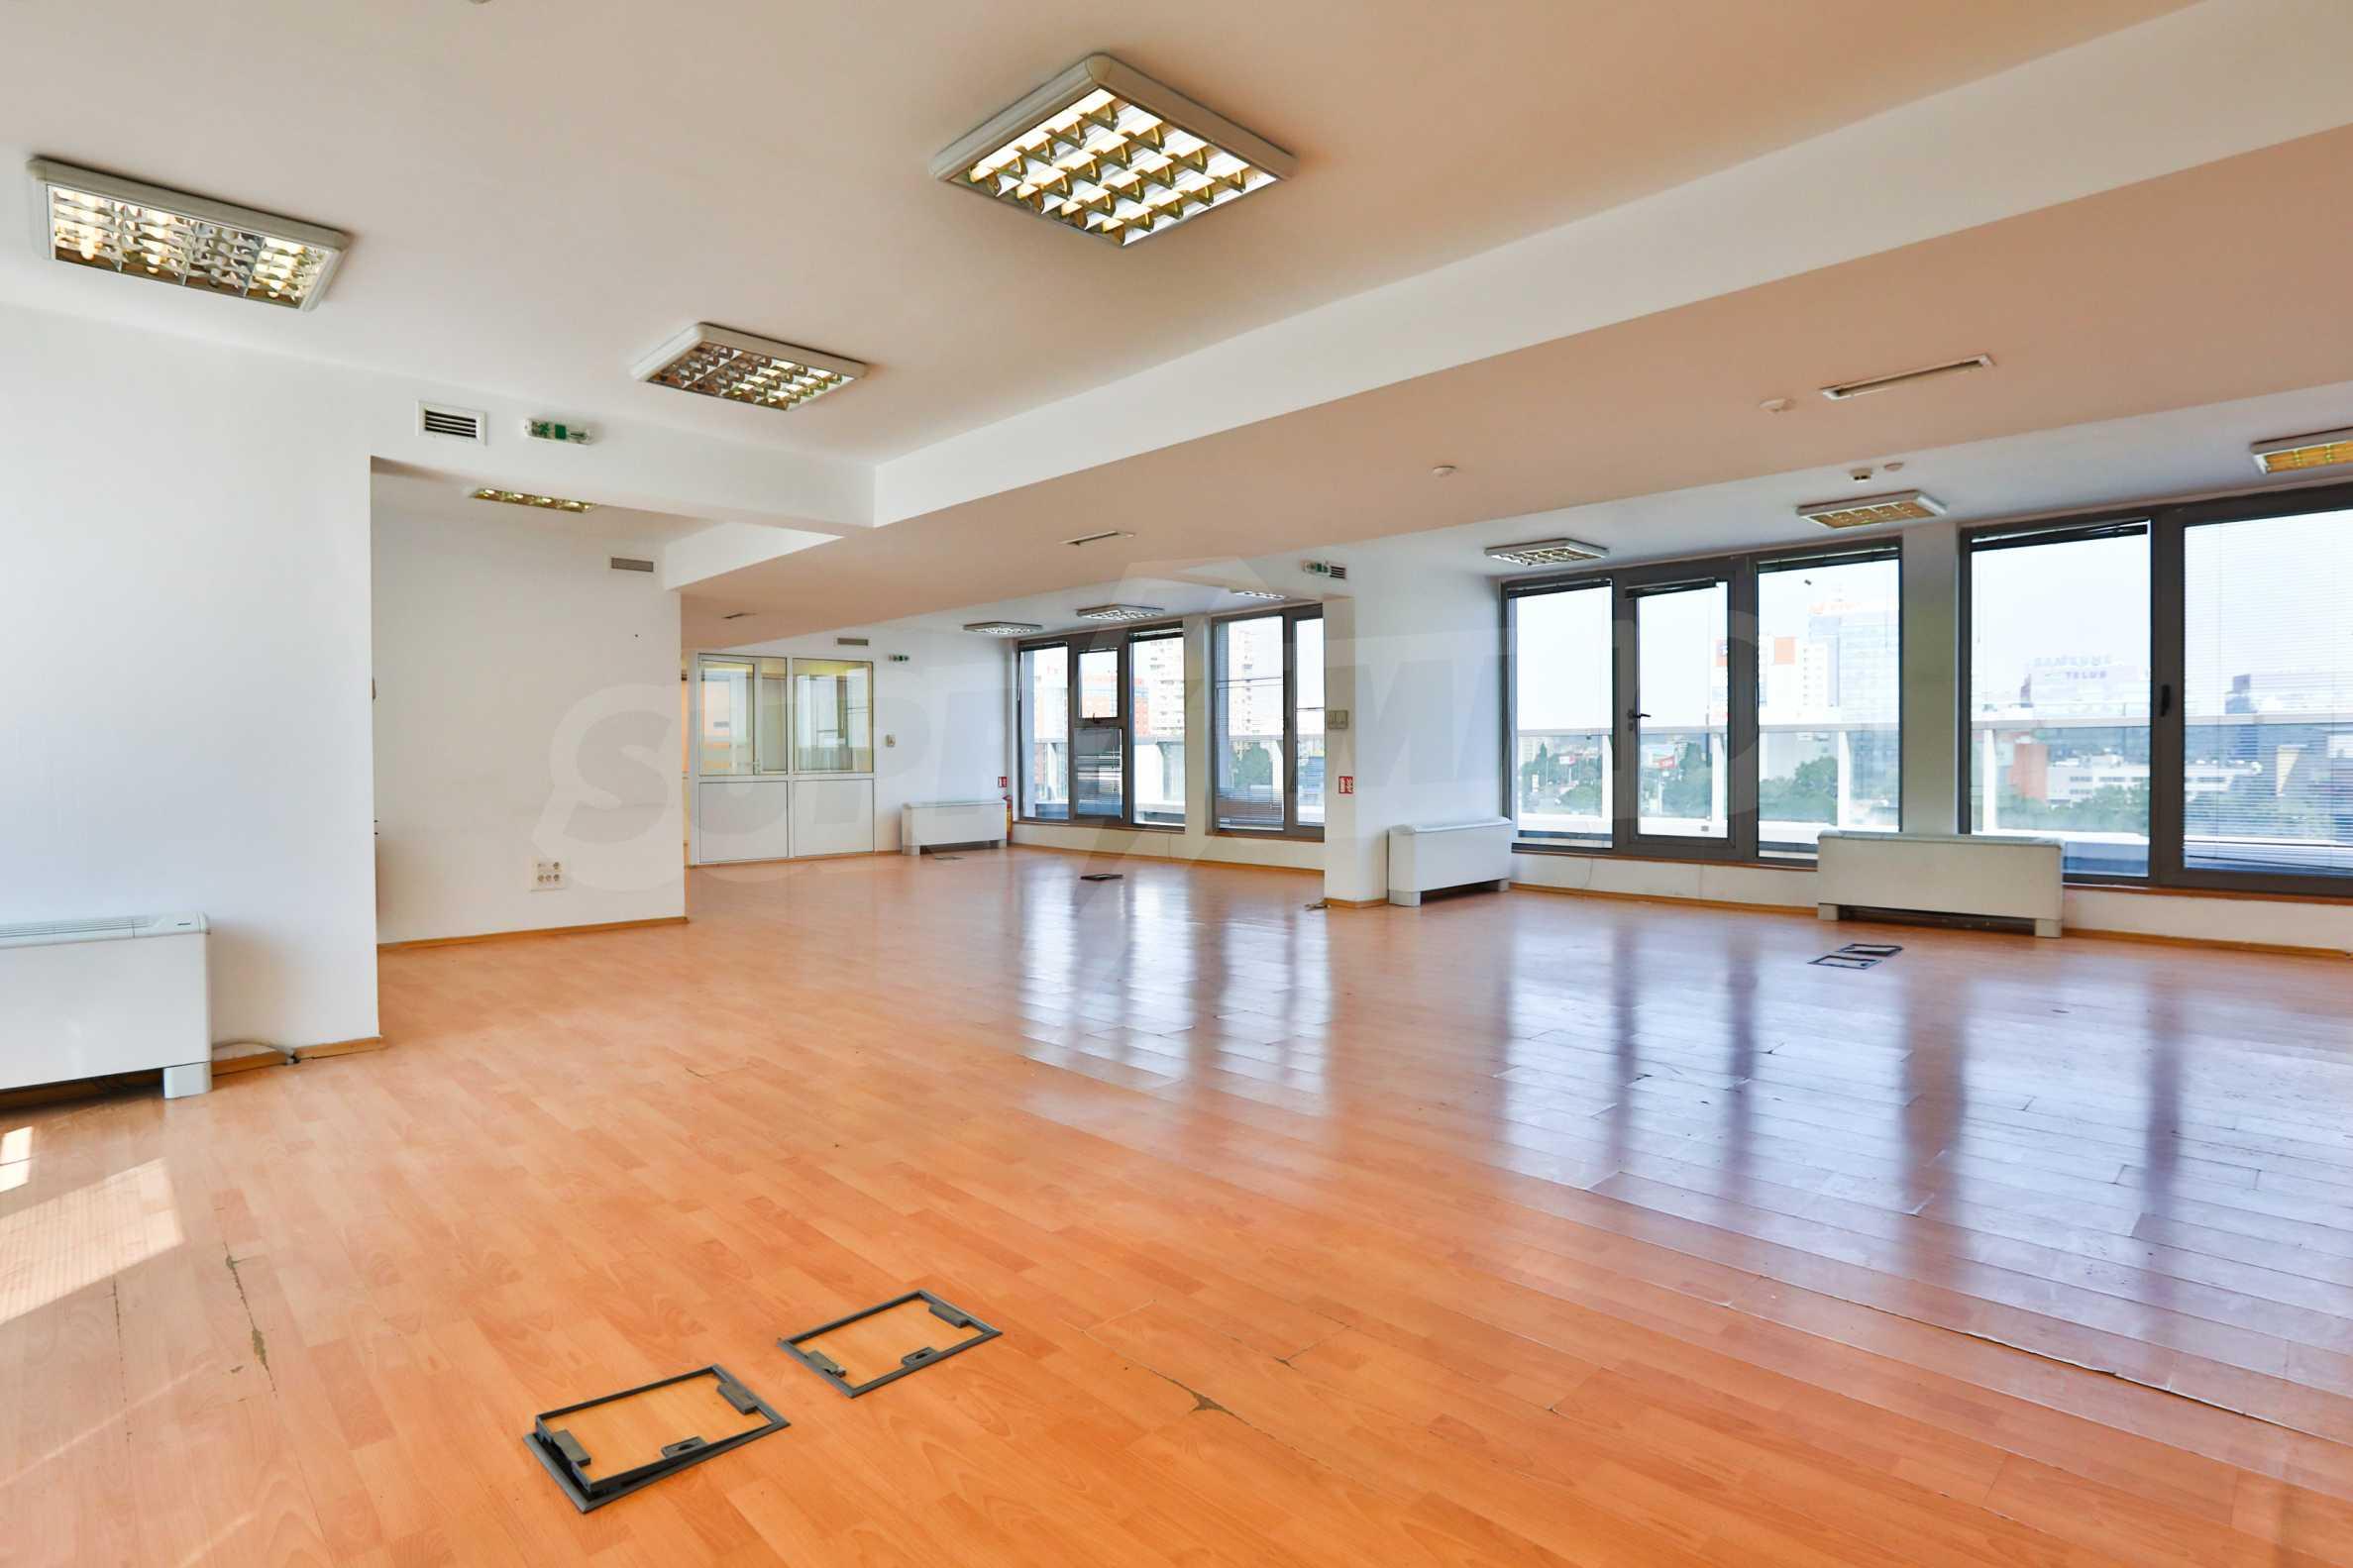 Офис в бизнес сграда висок клас на бул. Цариградско шосе 7